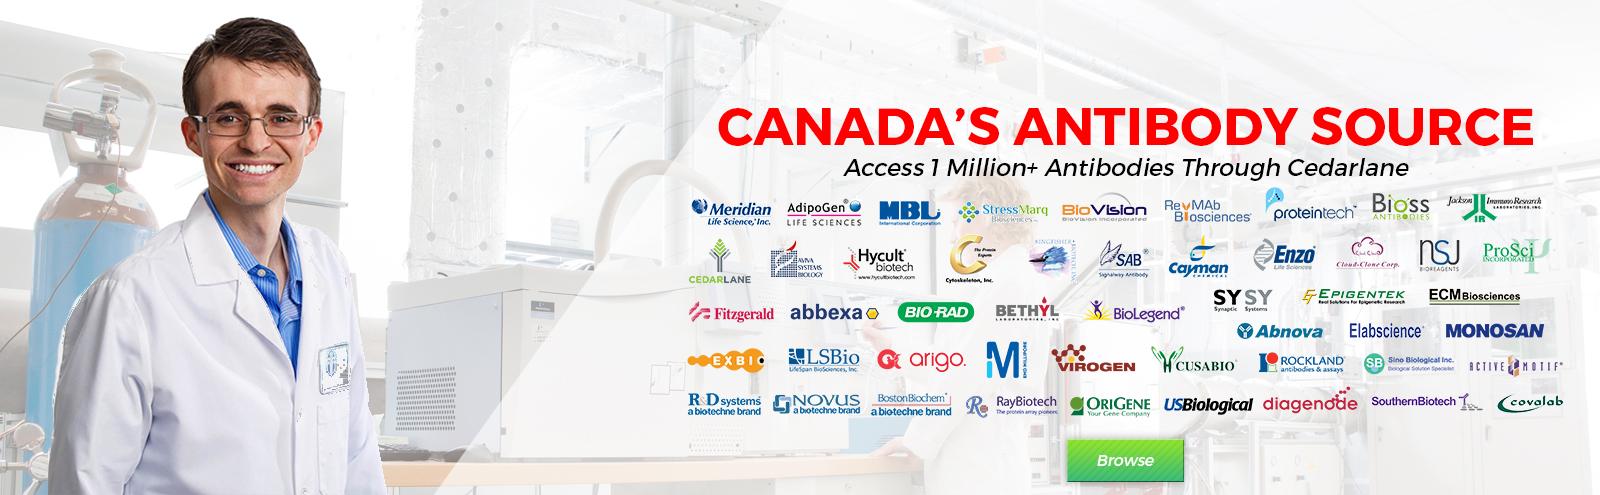 Canada Ab Source